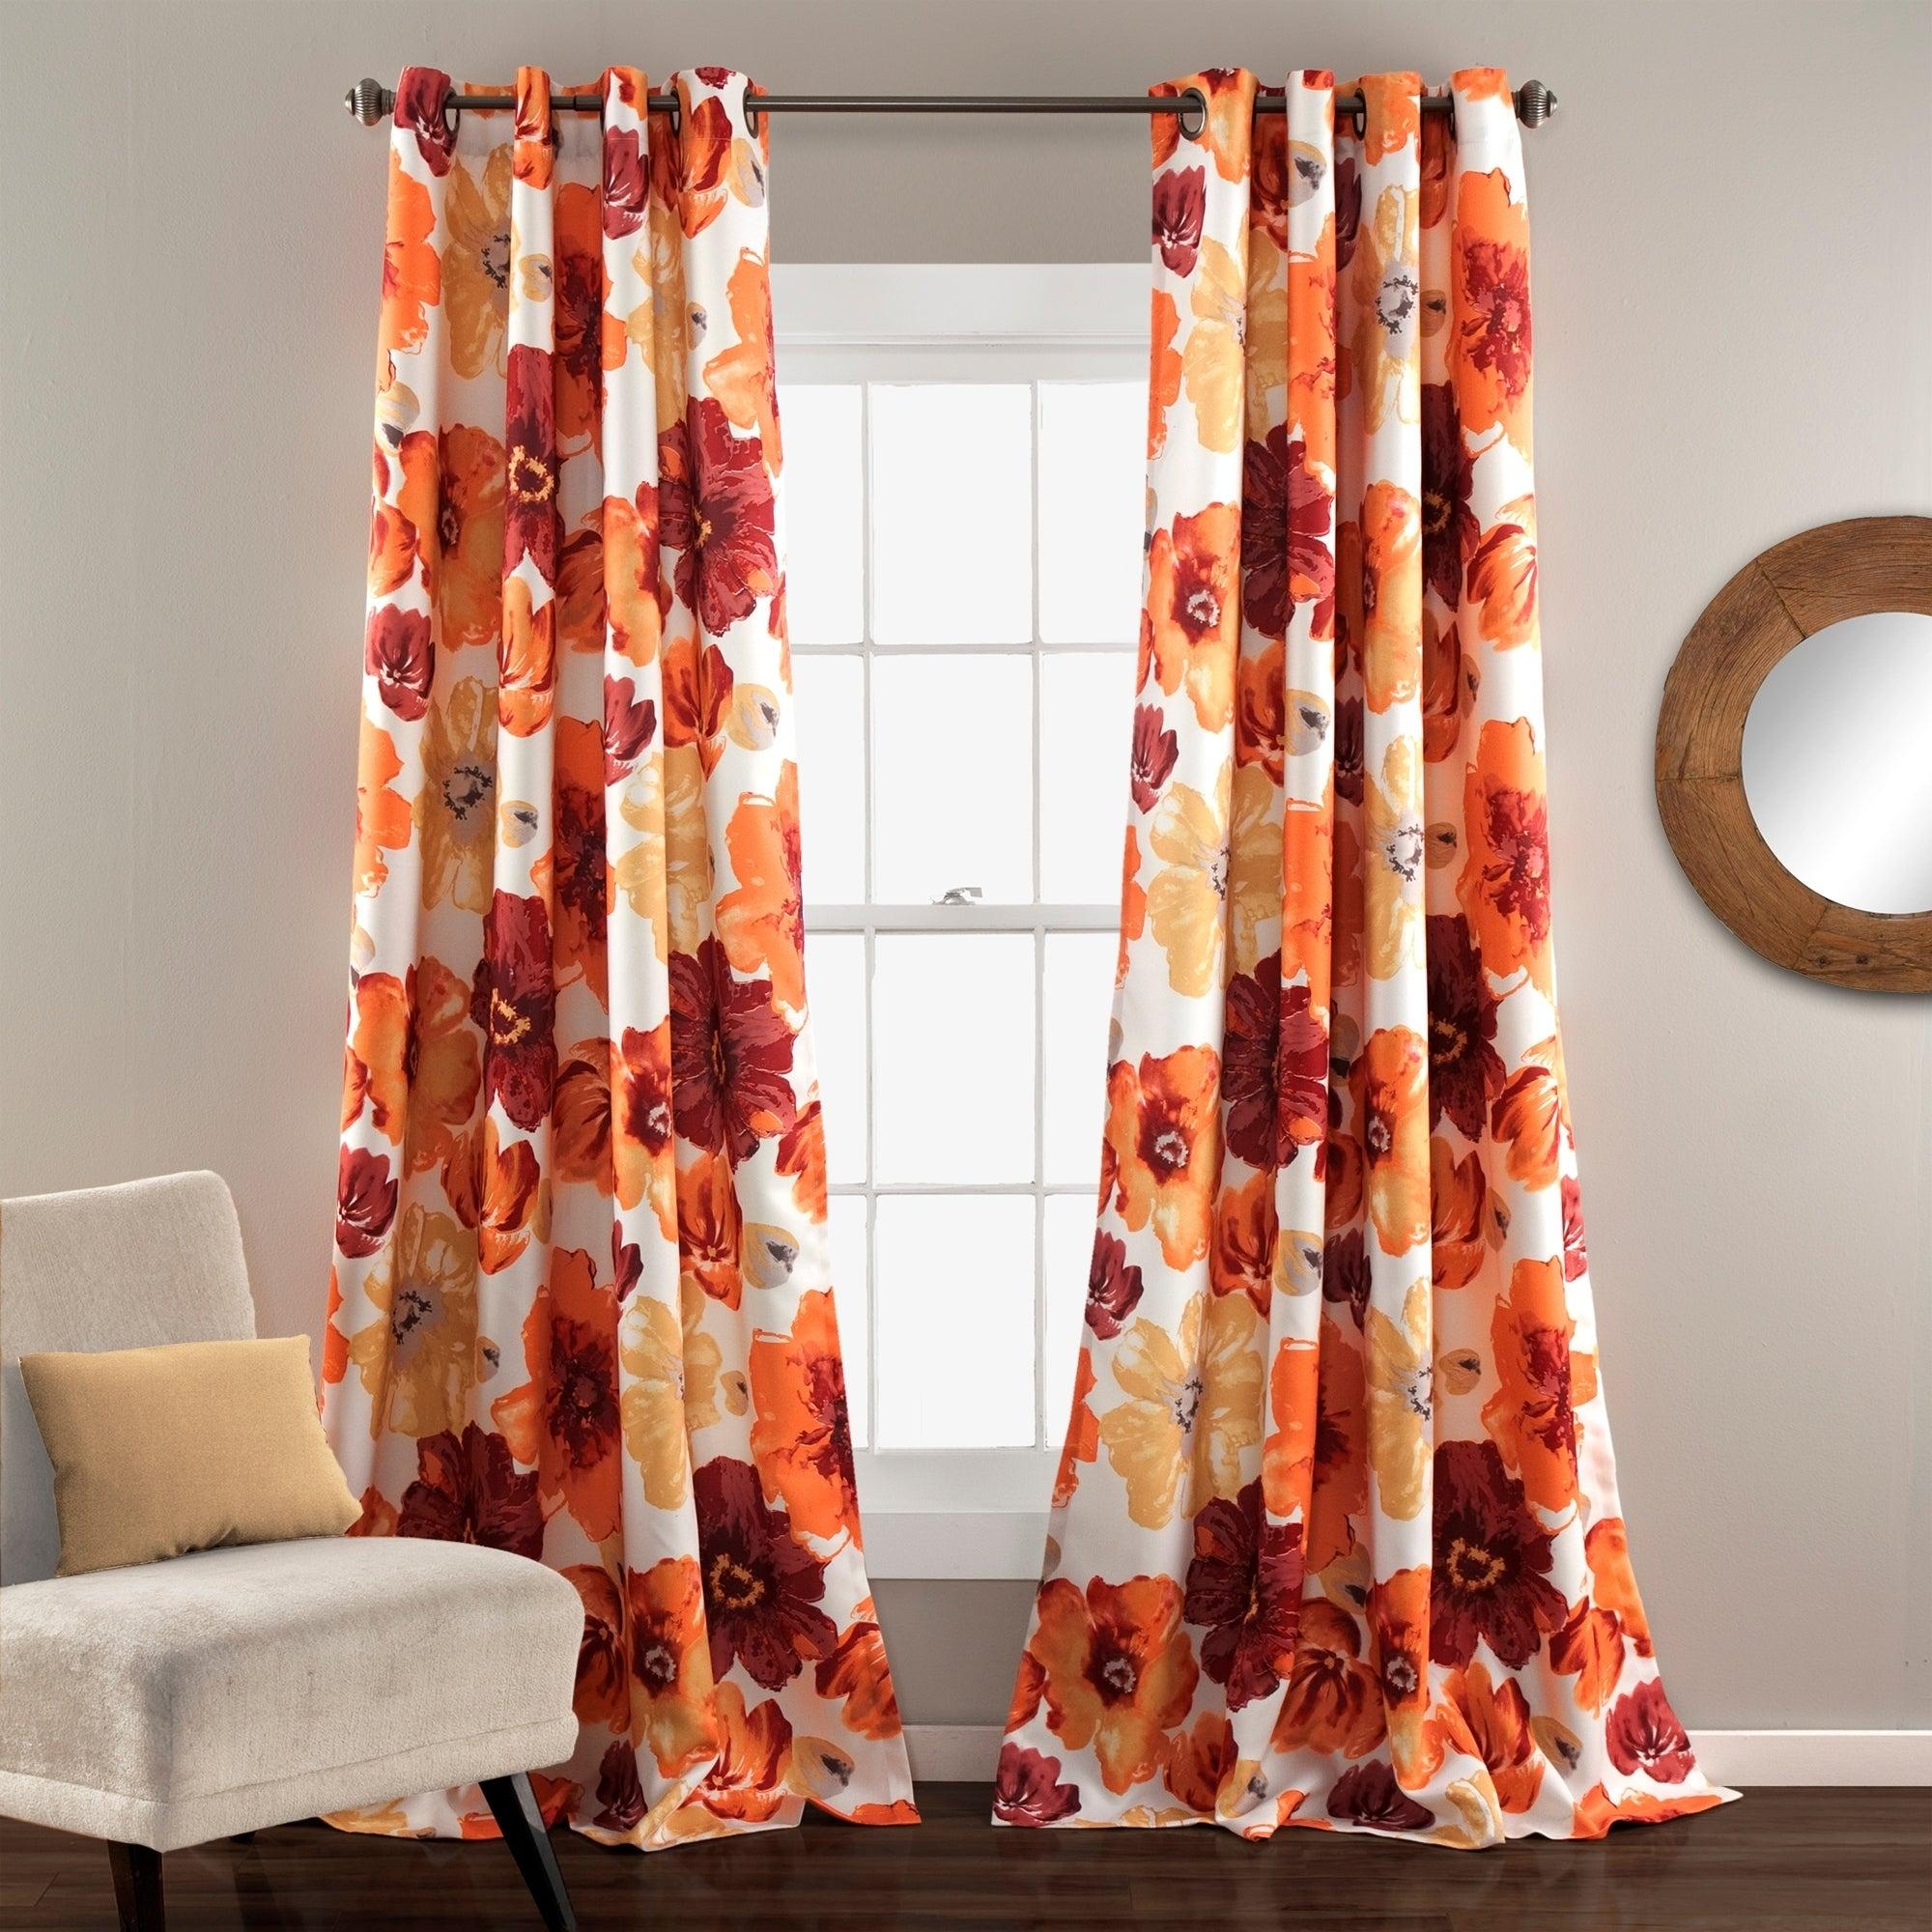 Lush Decor Leah Room Darkening Curtain Panel Pair For Leah Room Darkening Curtain Panel Pairs (View 6 of 20)